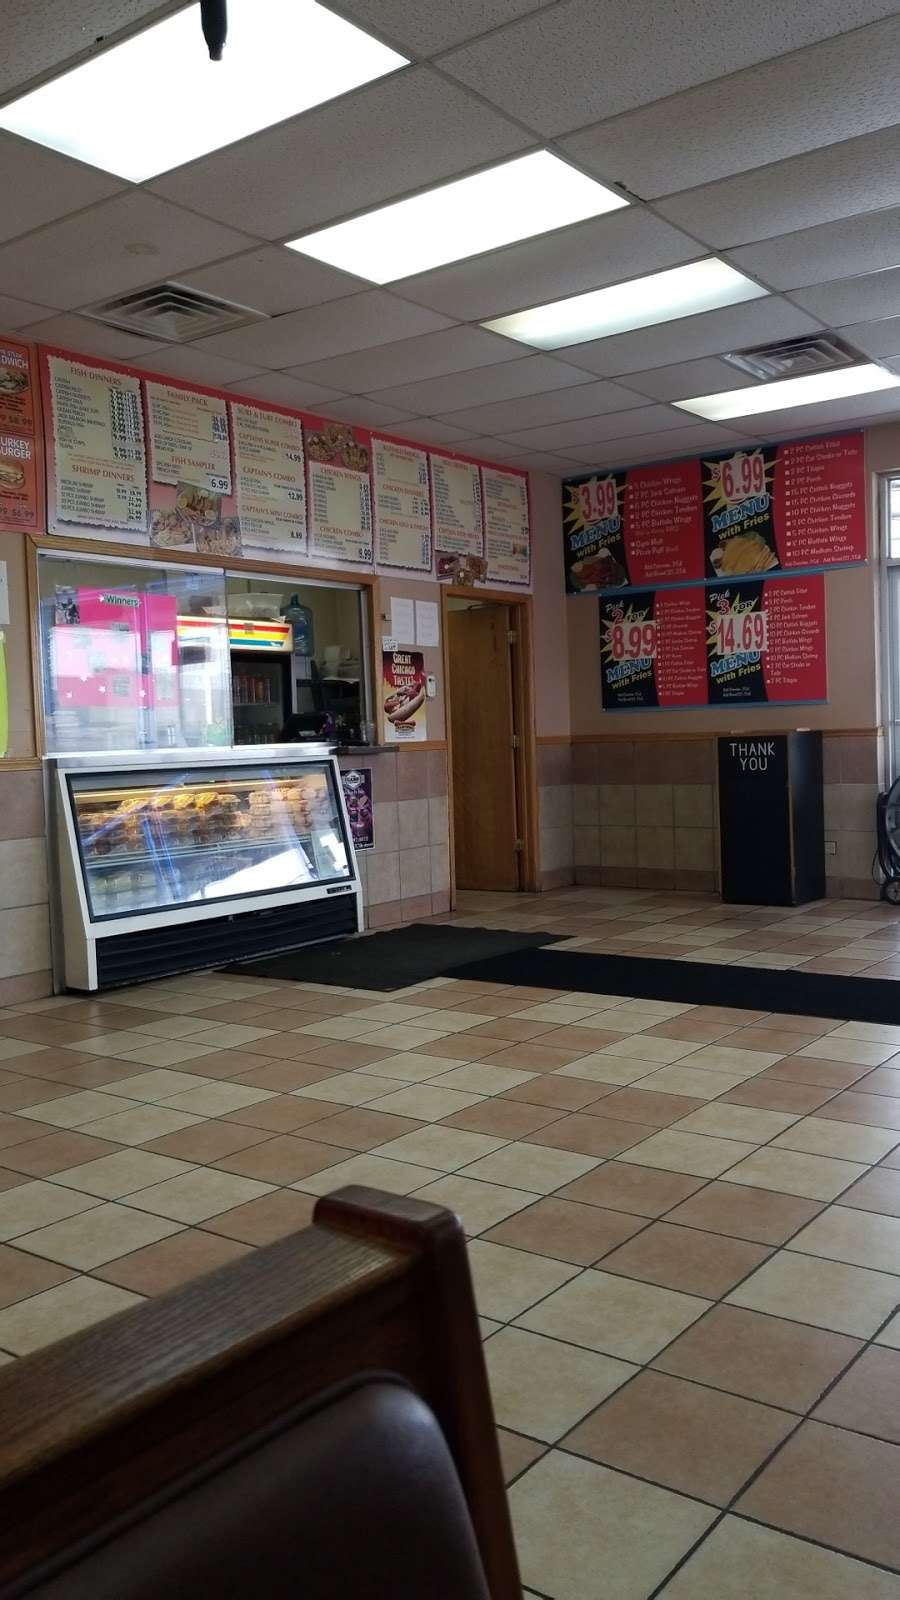 Captain Fresh Fish & Chicken - restaurant    Photo 8 of 10   Address: 1633 E Court St, Kankakee, IL 60901, USA   Phone: (815) 933-8422